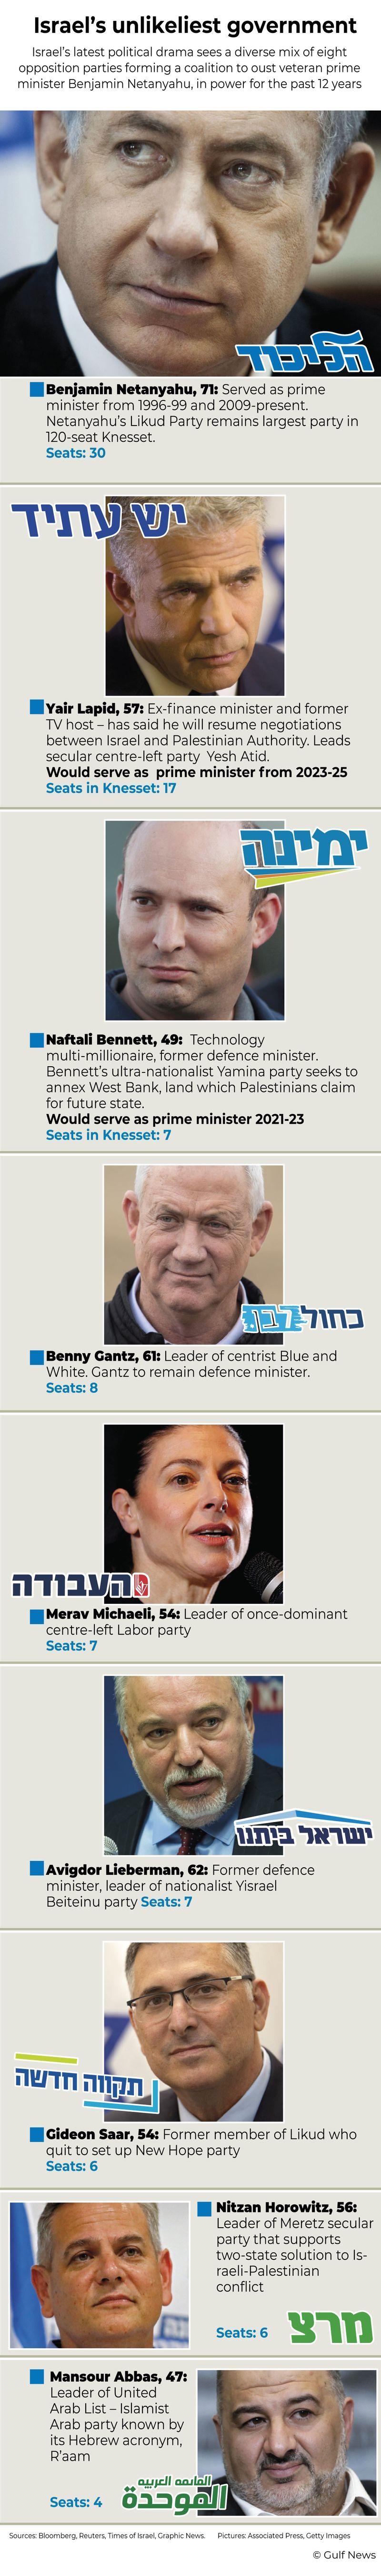 Infographic: Israel's unlikeliest government